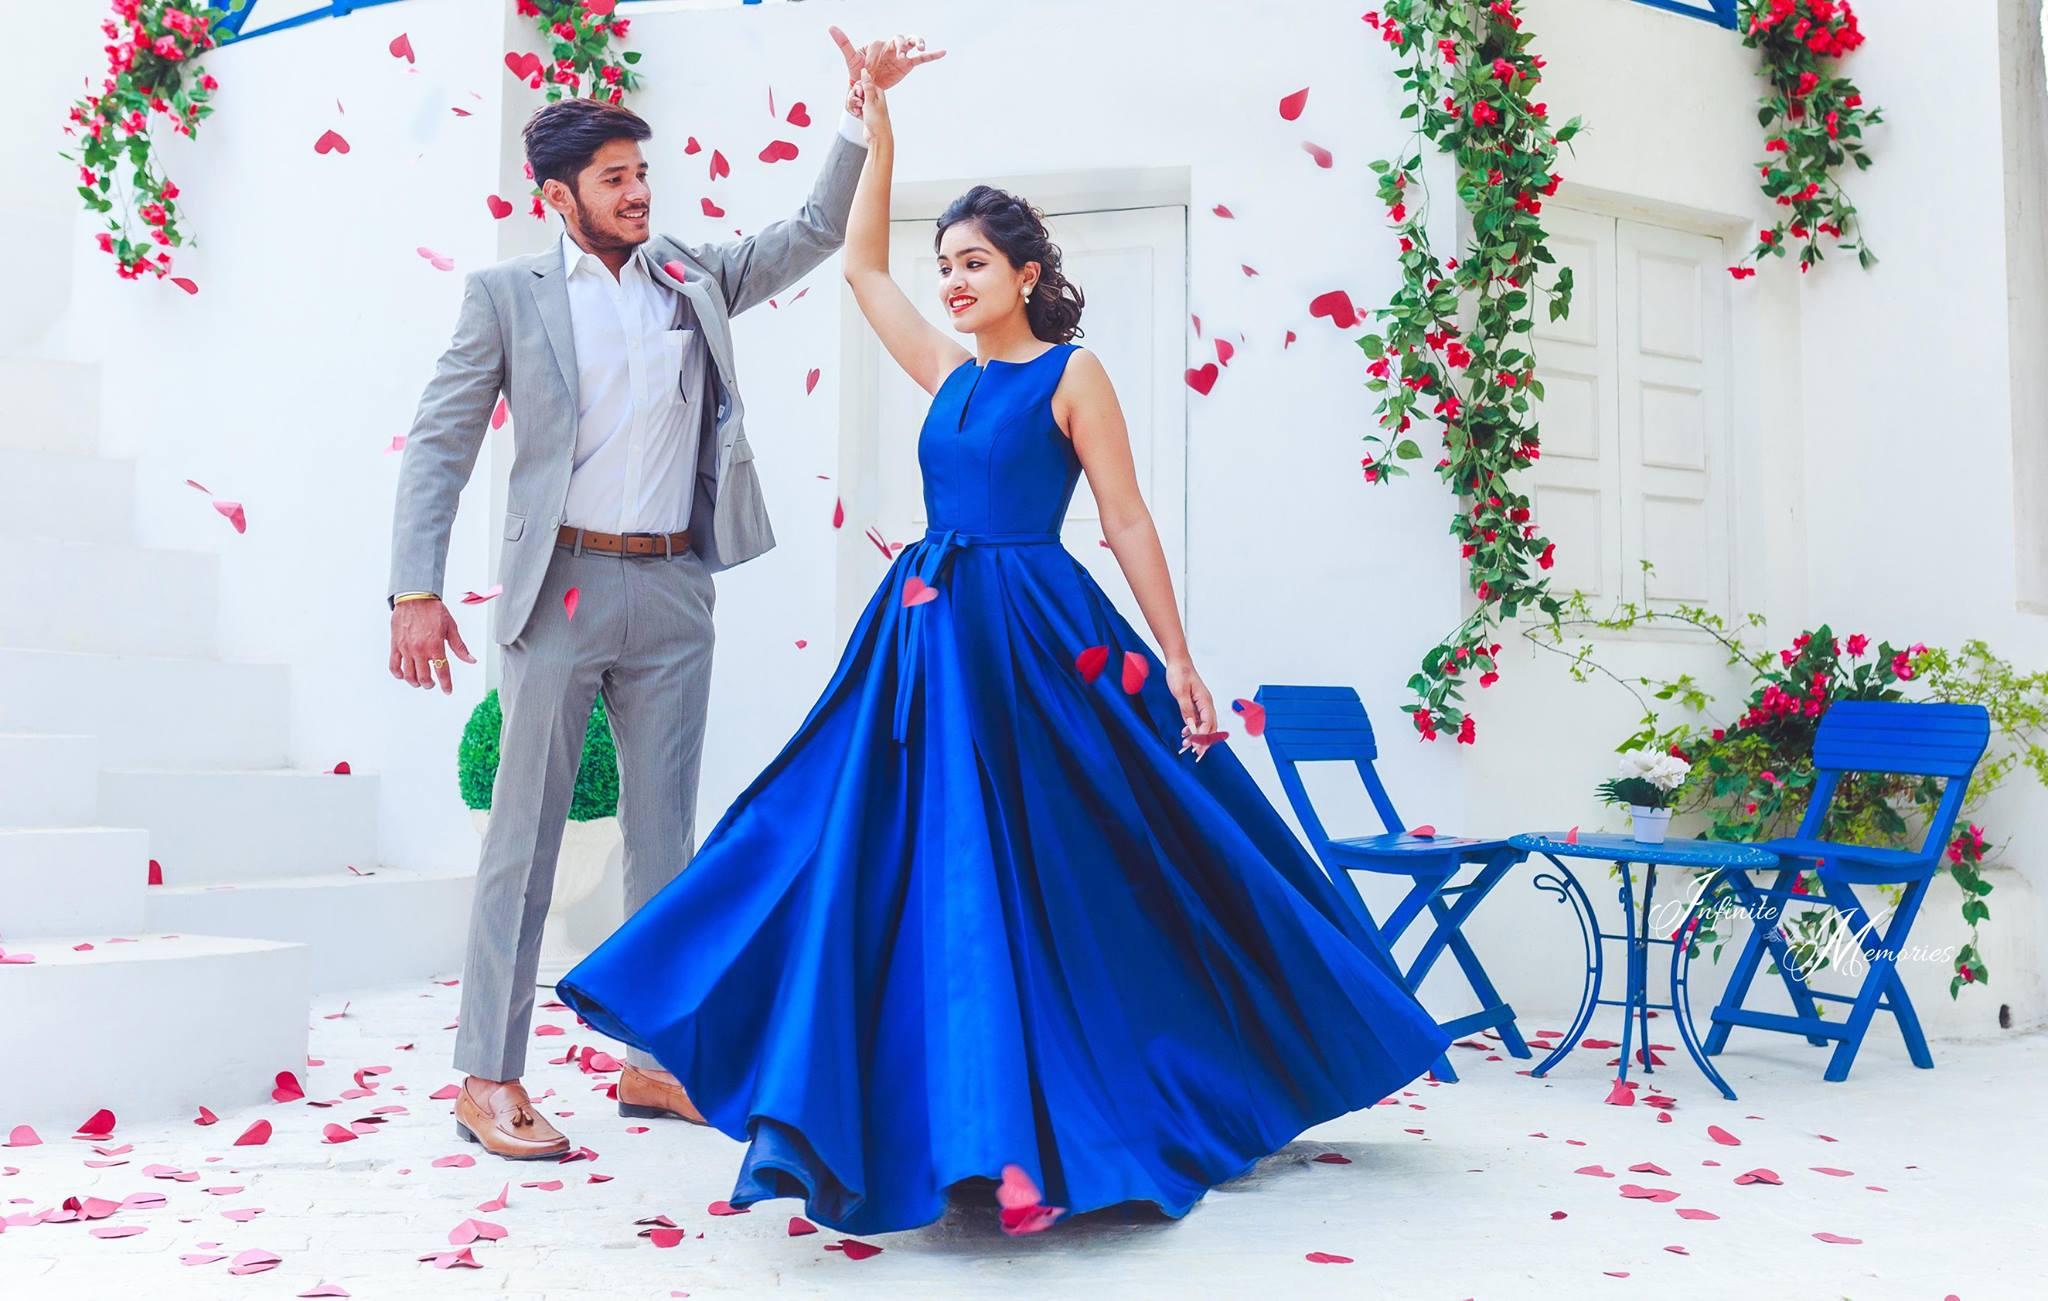 7 Wedding Trends From Sabyasachi's Spring-Summer